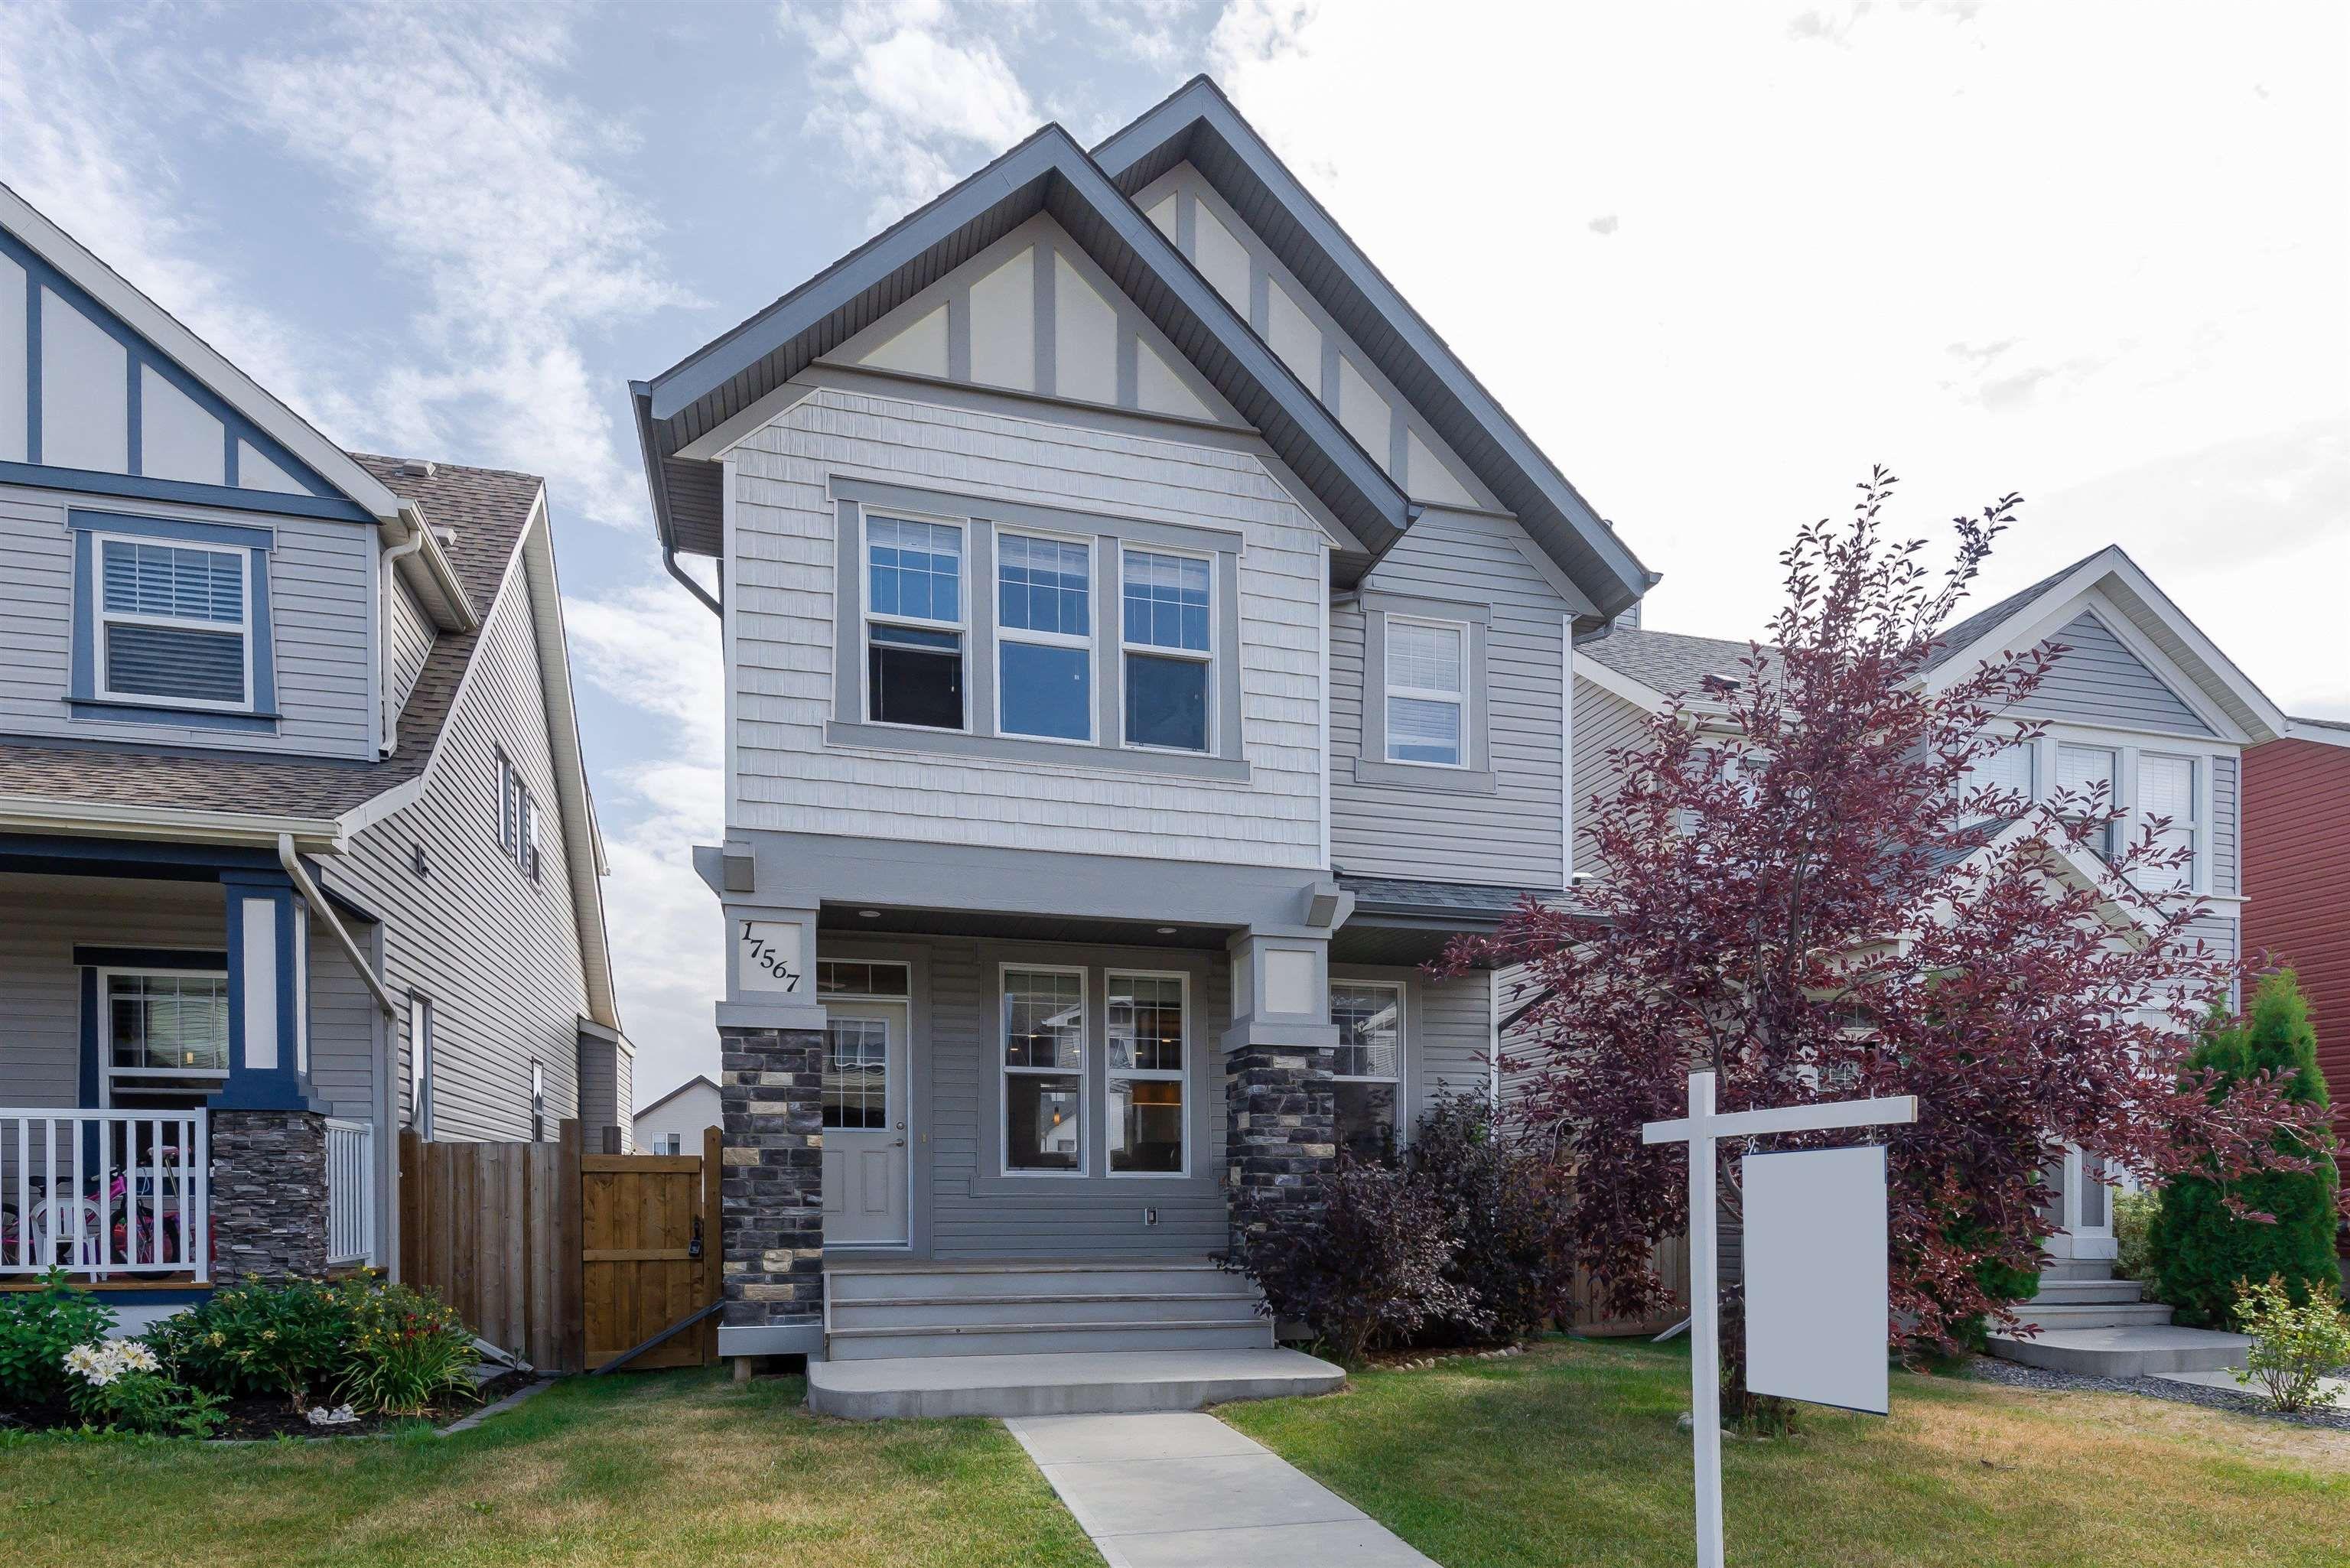 Main Photo: 17567 59 Street in Edmonton: Zone 03 House for sale : MLS®# E4259556